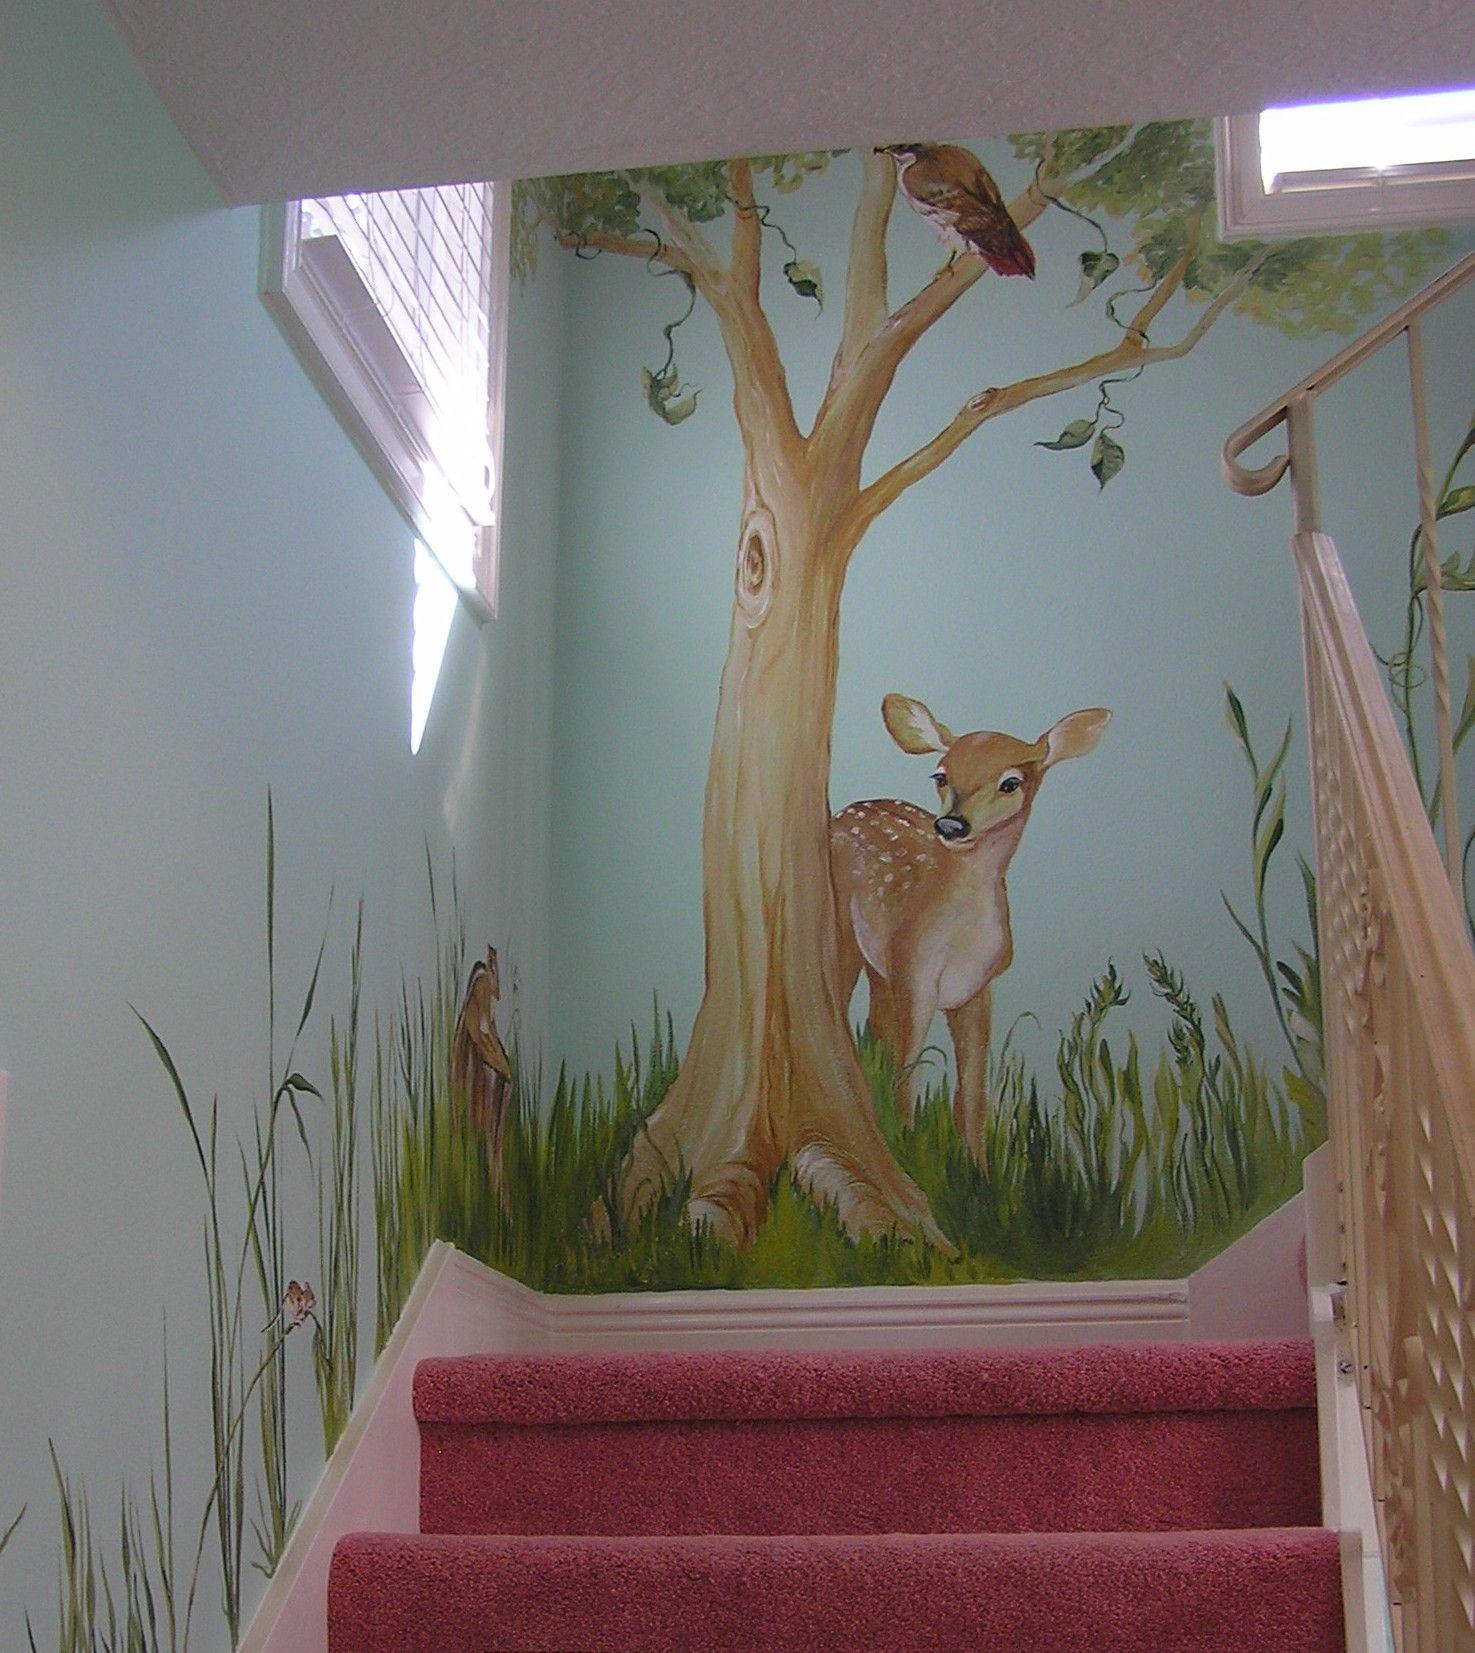 Childrens murals bing images fantastic work church nursery kids room murals by childrens mural artist juli simon kissimmee fl amipublicfo Images